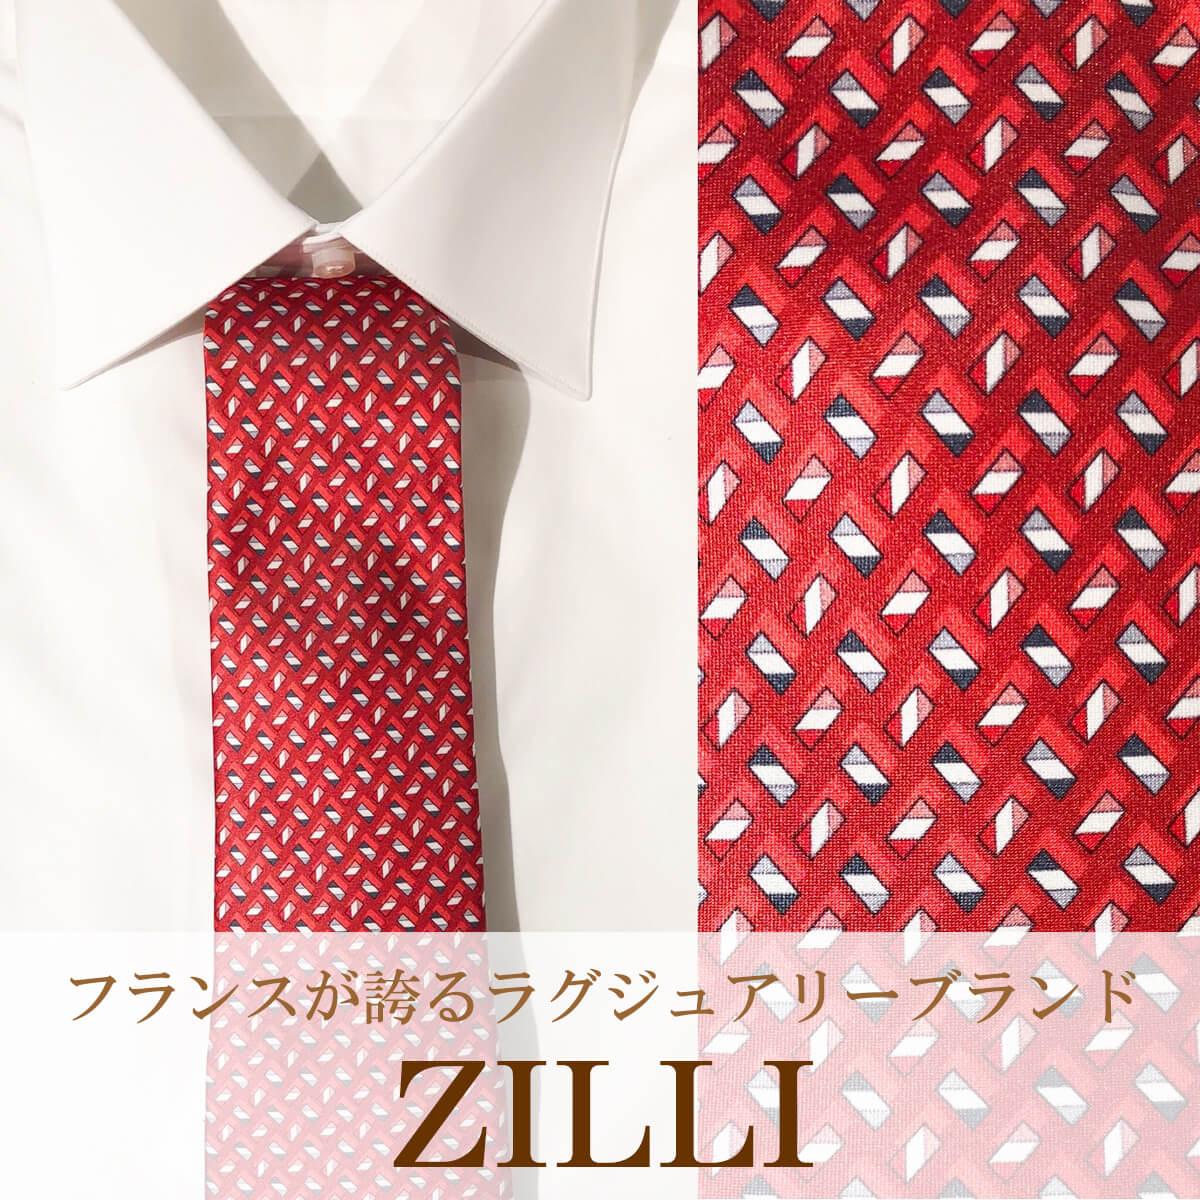 ZILLI (ジリー)ネクタイ ブランド 高級 ジリー ZILLI シルク プリント セブンフォールド おしゃれ 結婚式 パーティー